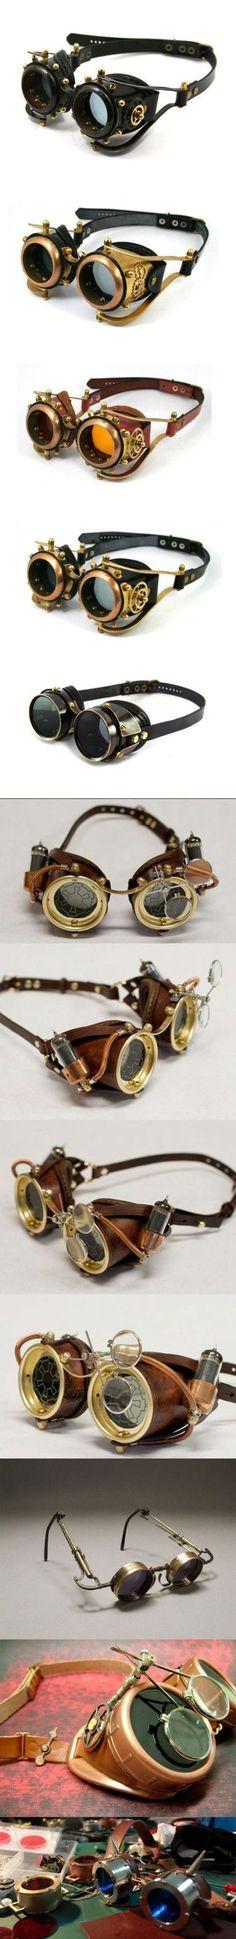 02416e90602ba Cool  steampunk  eyewear. I d wear these while ridding my bike  steampunkeer